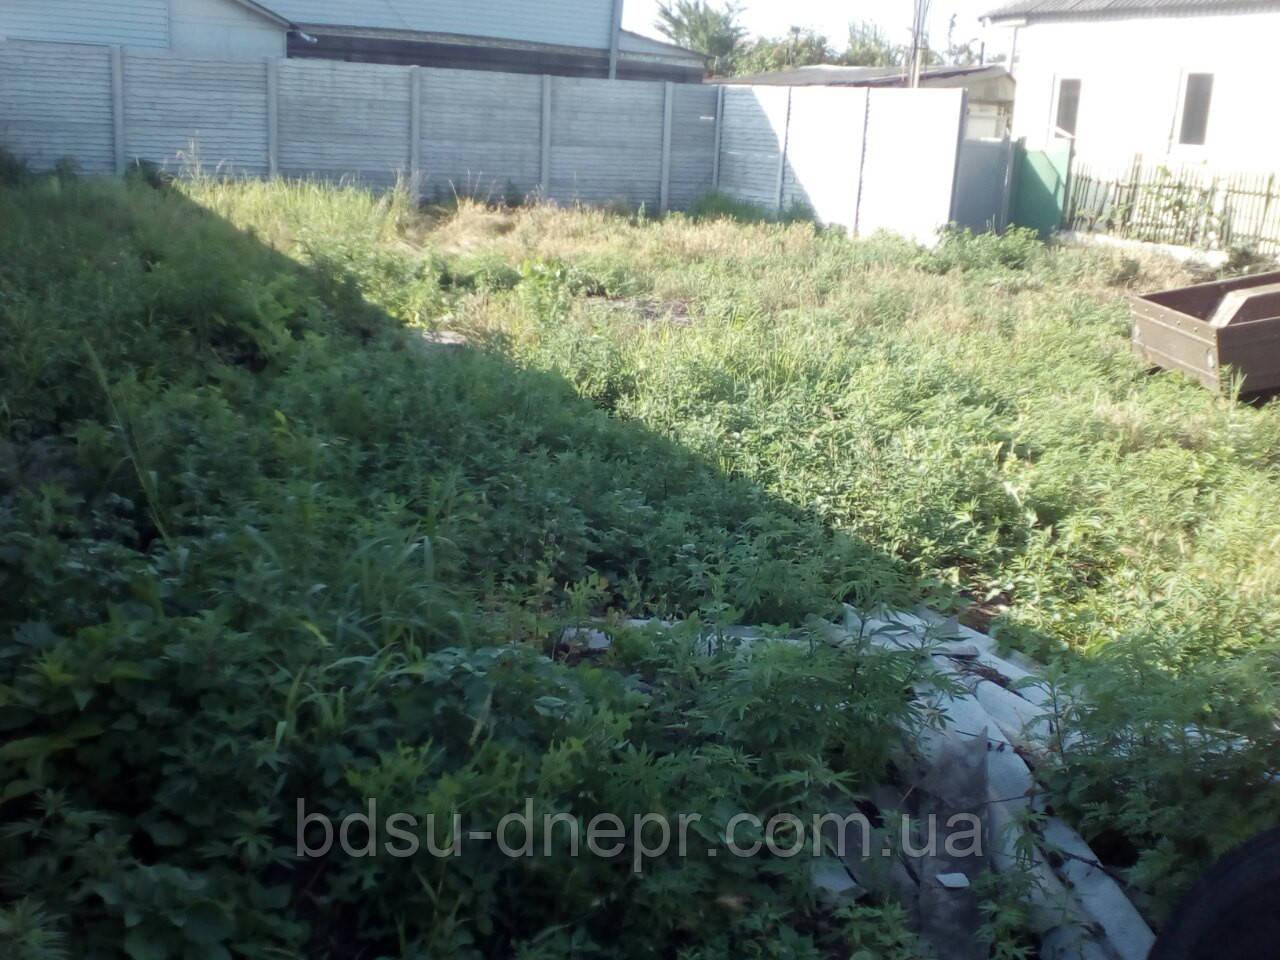 Уборка дачного участка, корчёвка пней  в Днепропетровске